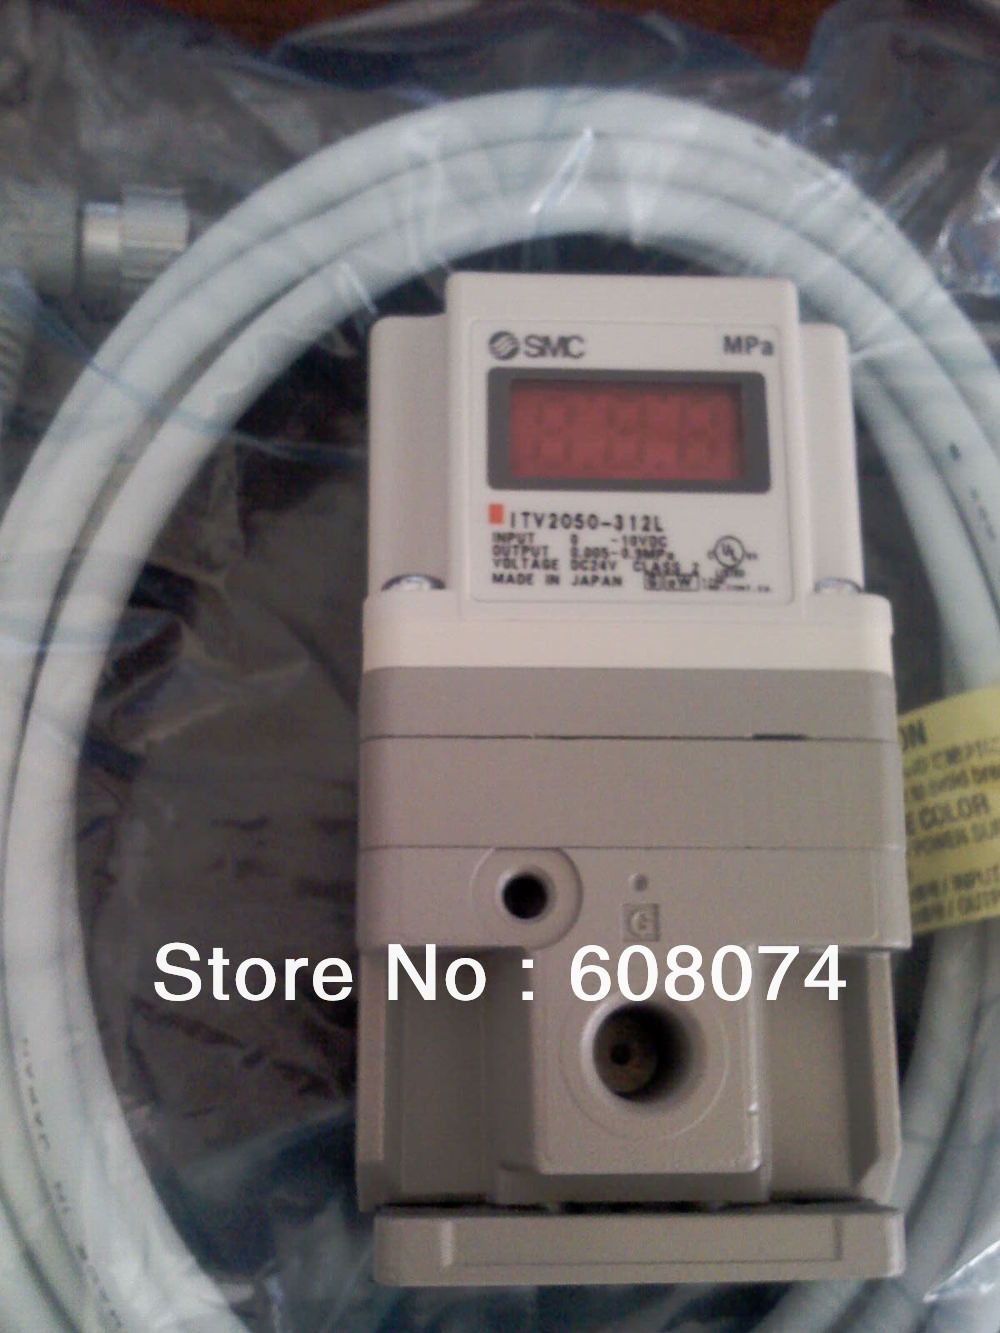 ITV2031-312L5 ELECTRO/PNEUMATIC REGULATOR, DC24V Rc1/4 PORT 0~10V itv2030 312l electro pneumatic regulator 24vdc 1 4 port 0 10v input